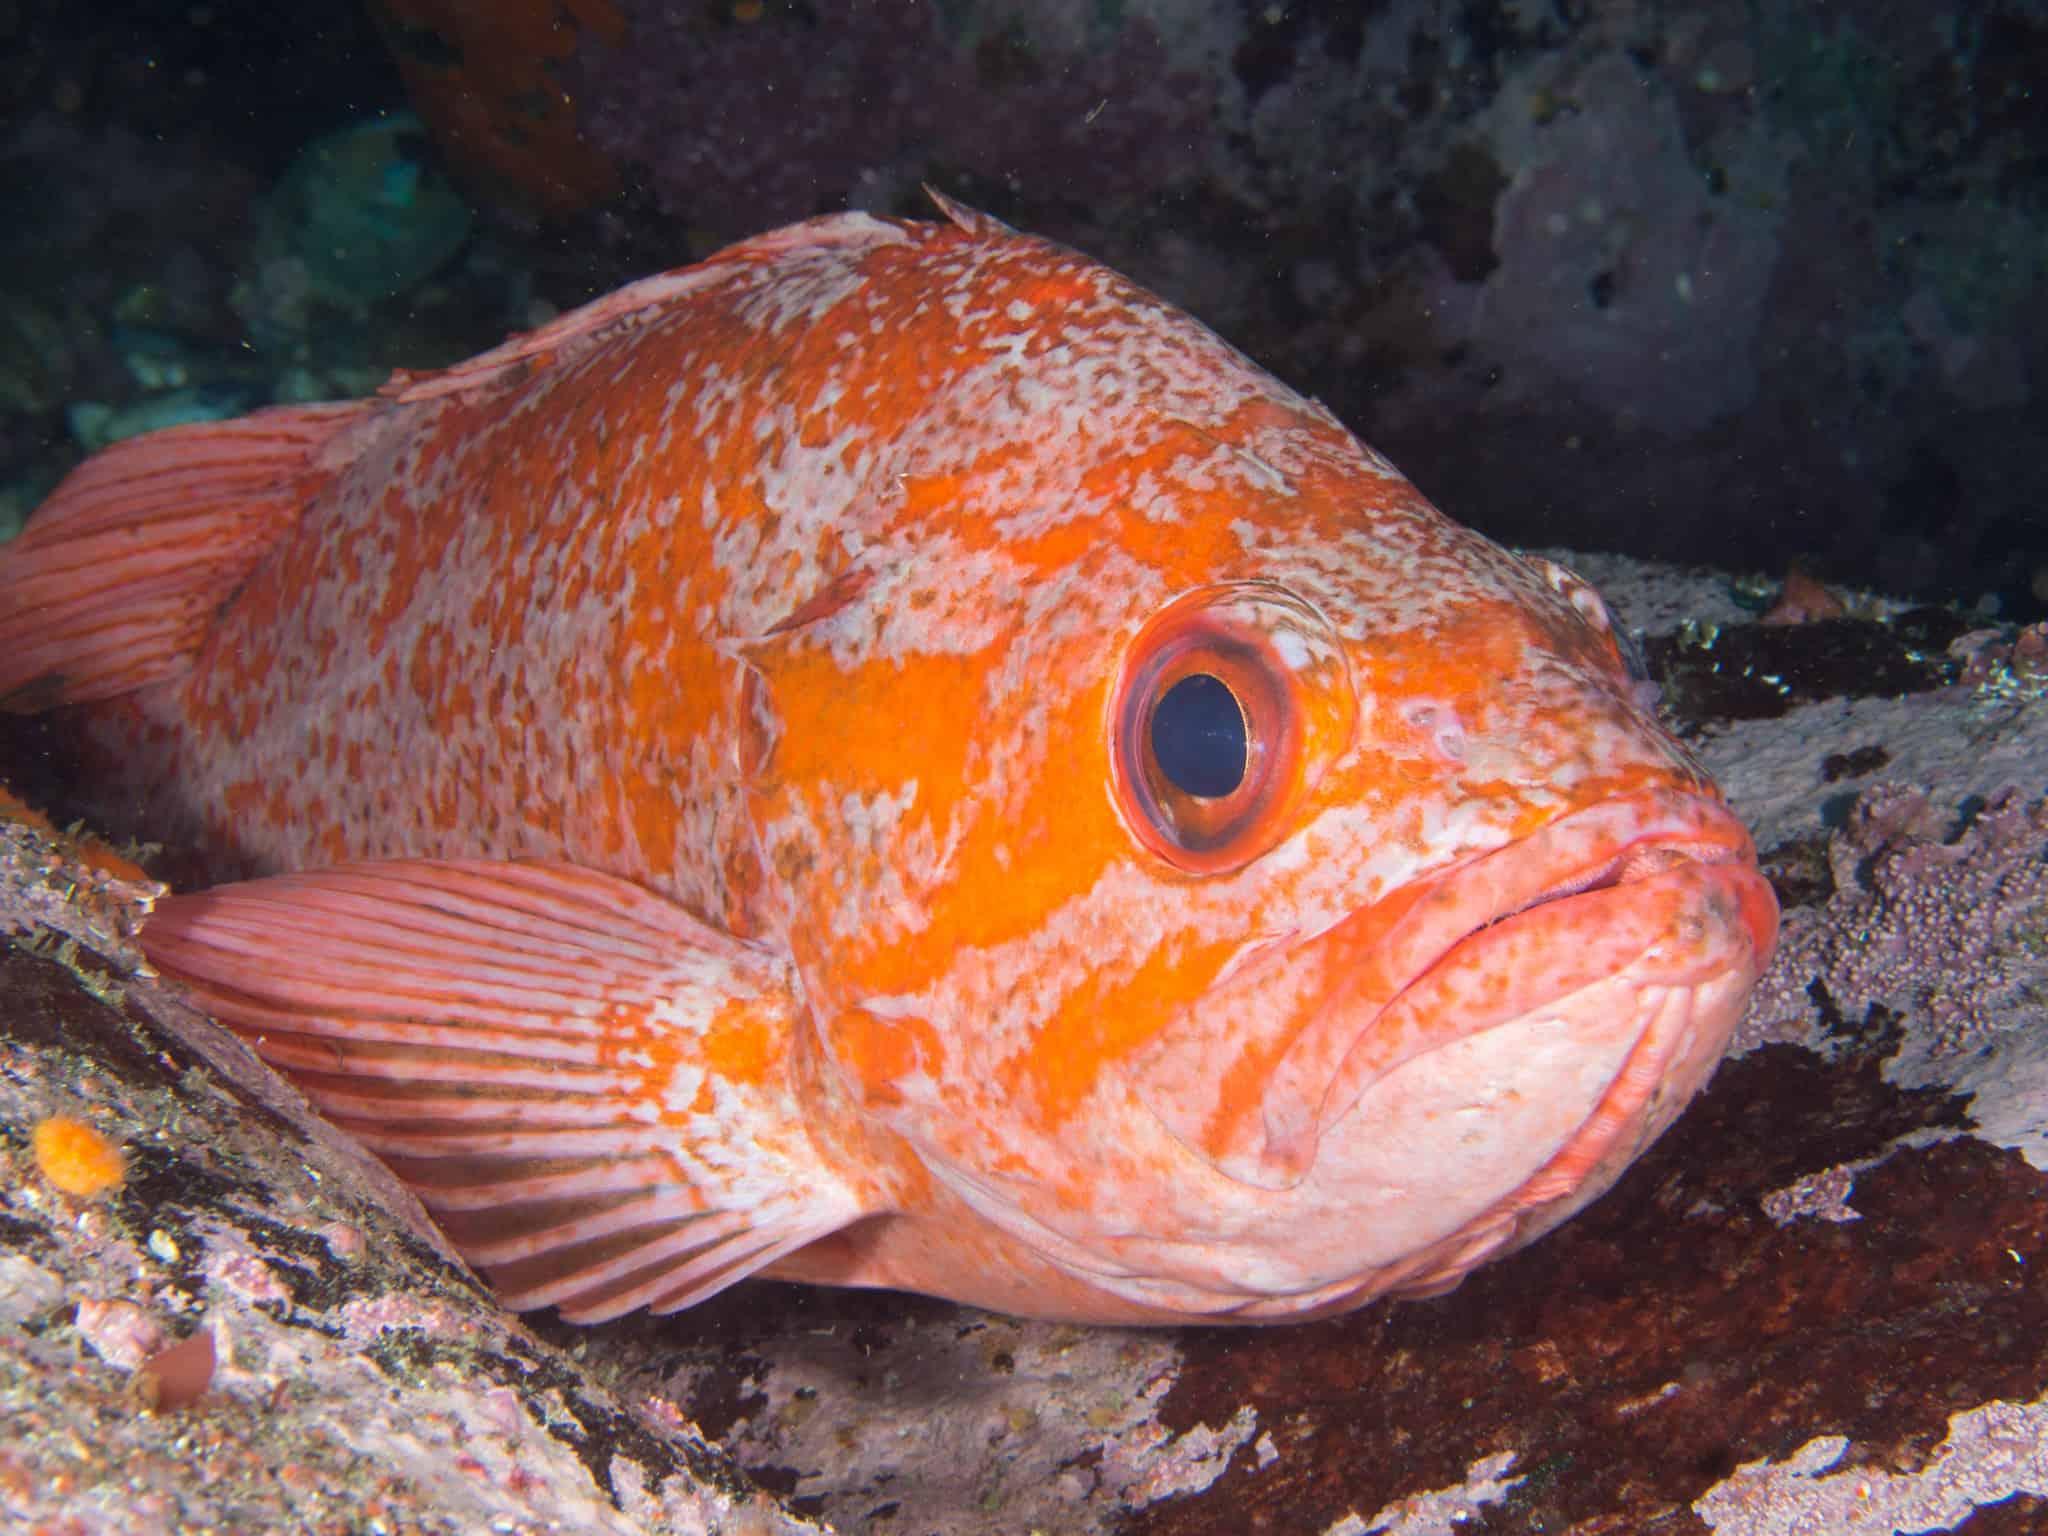 The vermilion rockfish